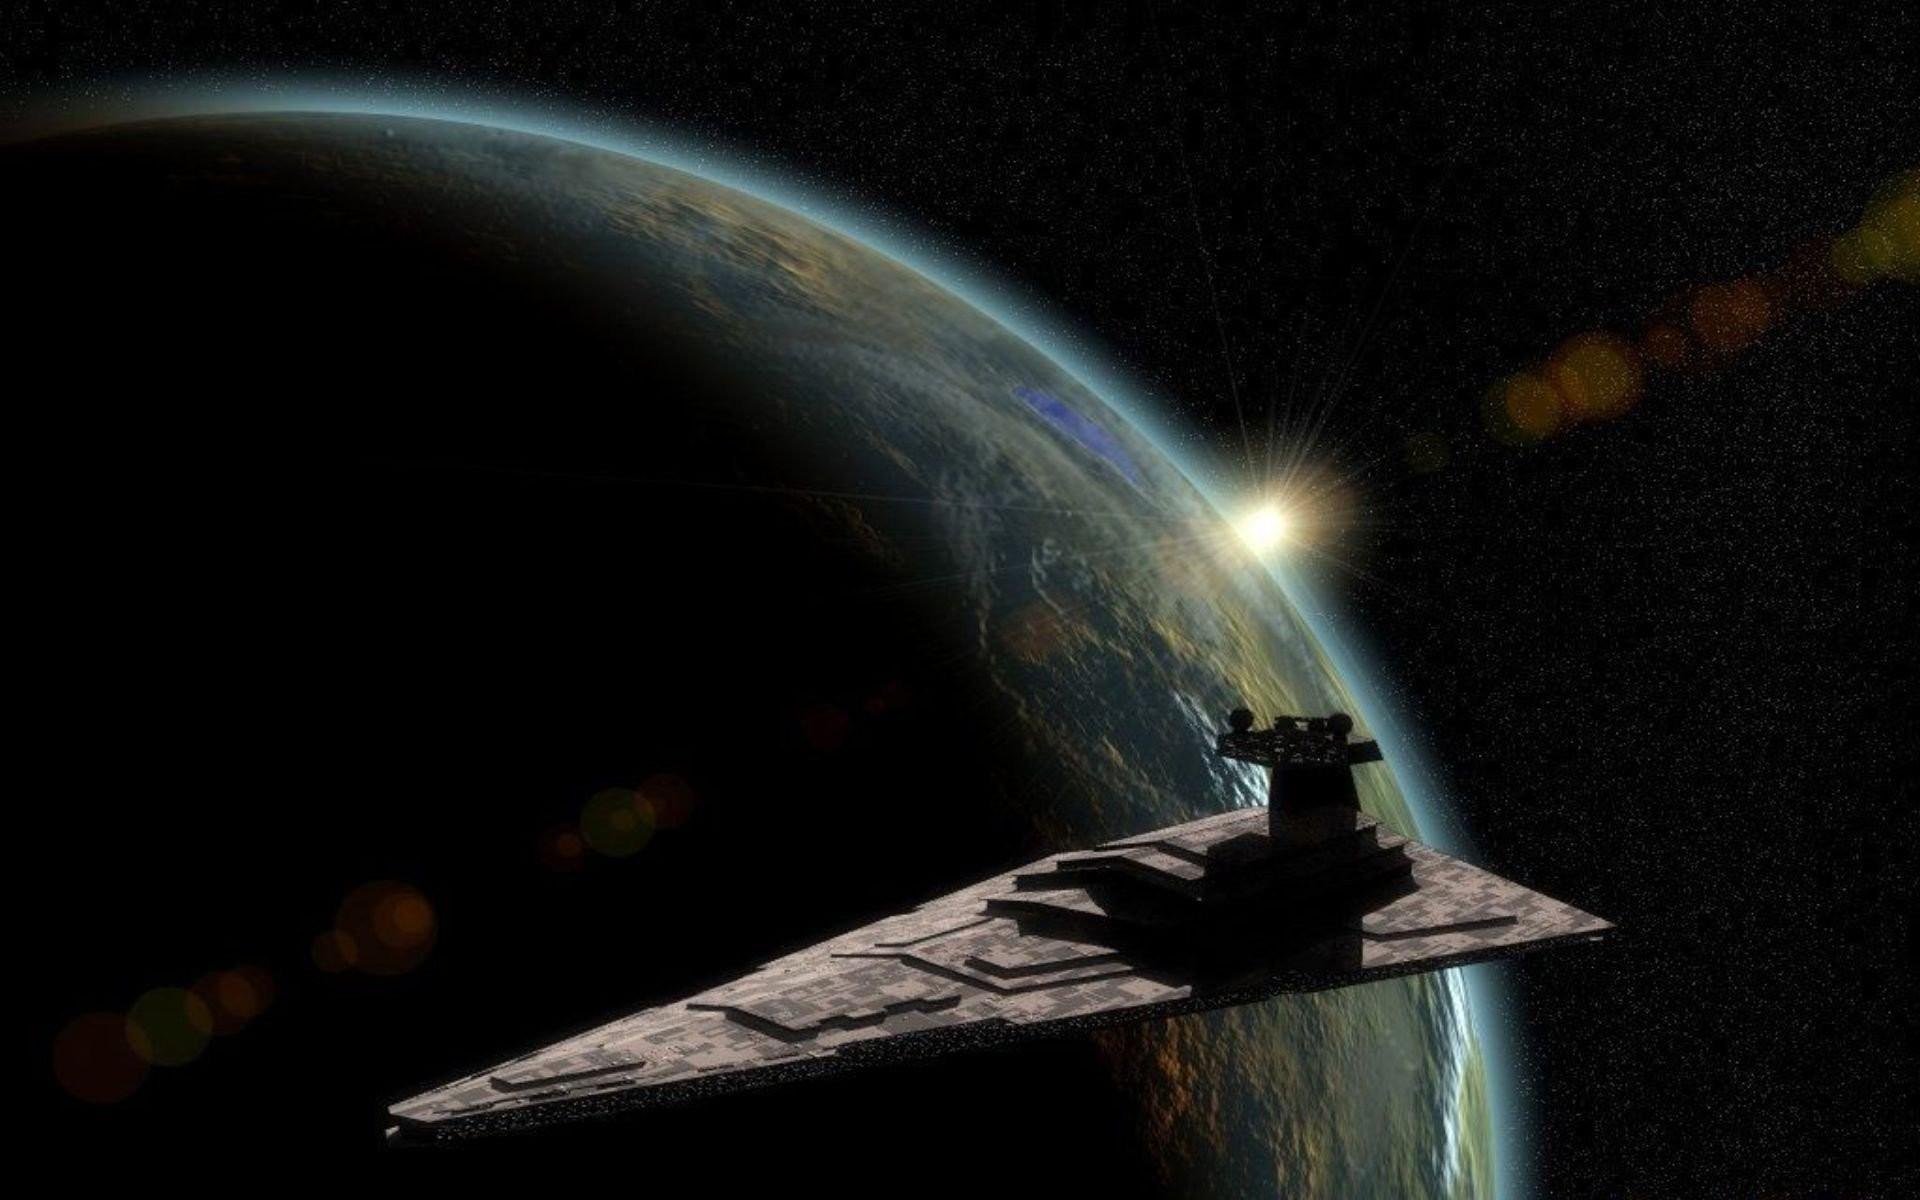 Star Wars outer space stars planets artwork Star Destroyer wallpaper .